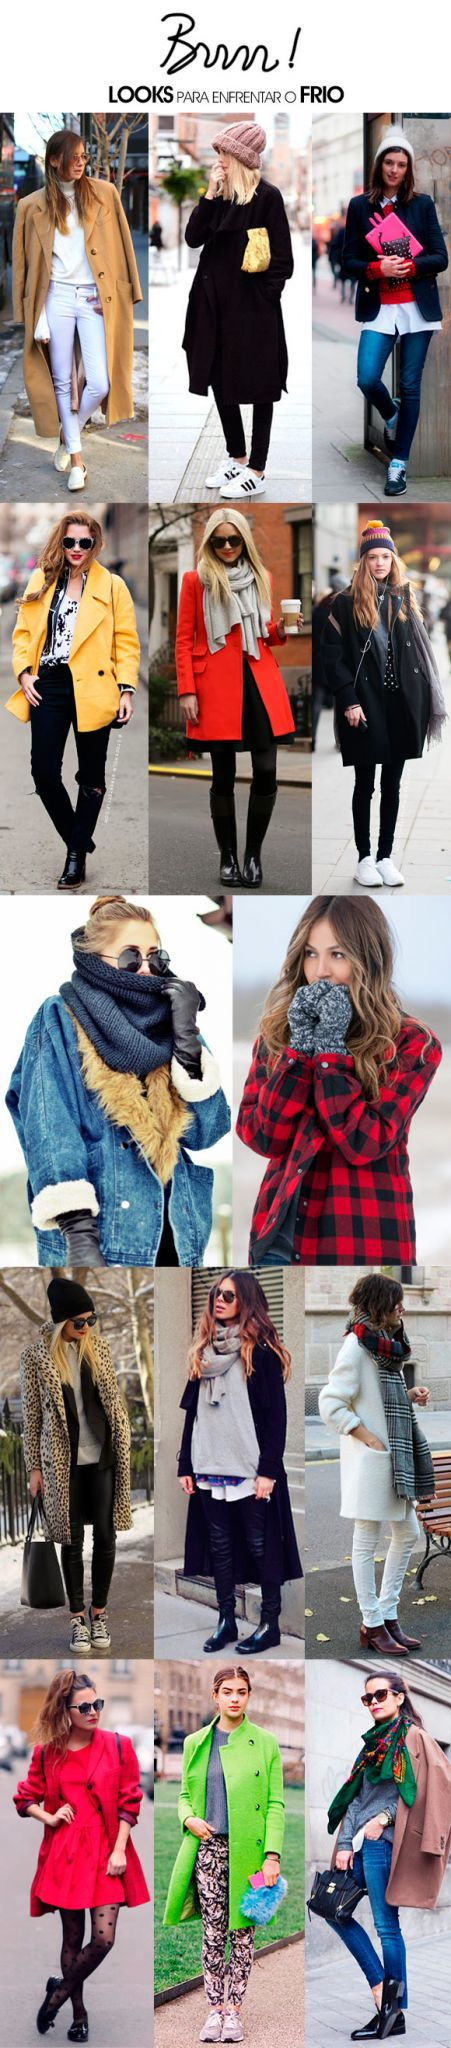 Achados da Bia   Moda   Look Frio   Inverno NY